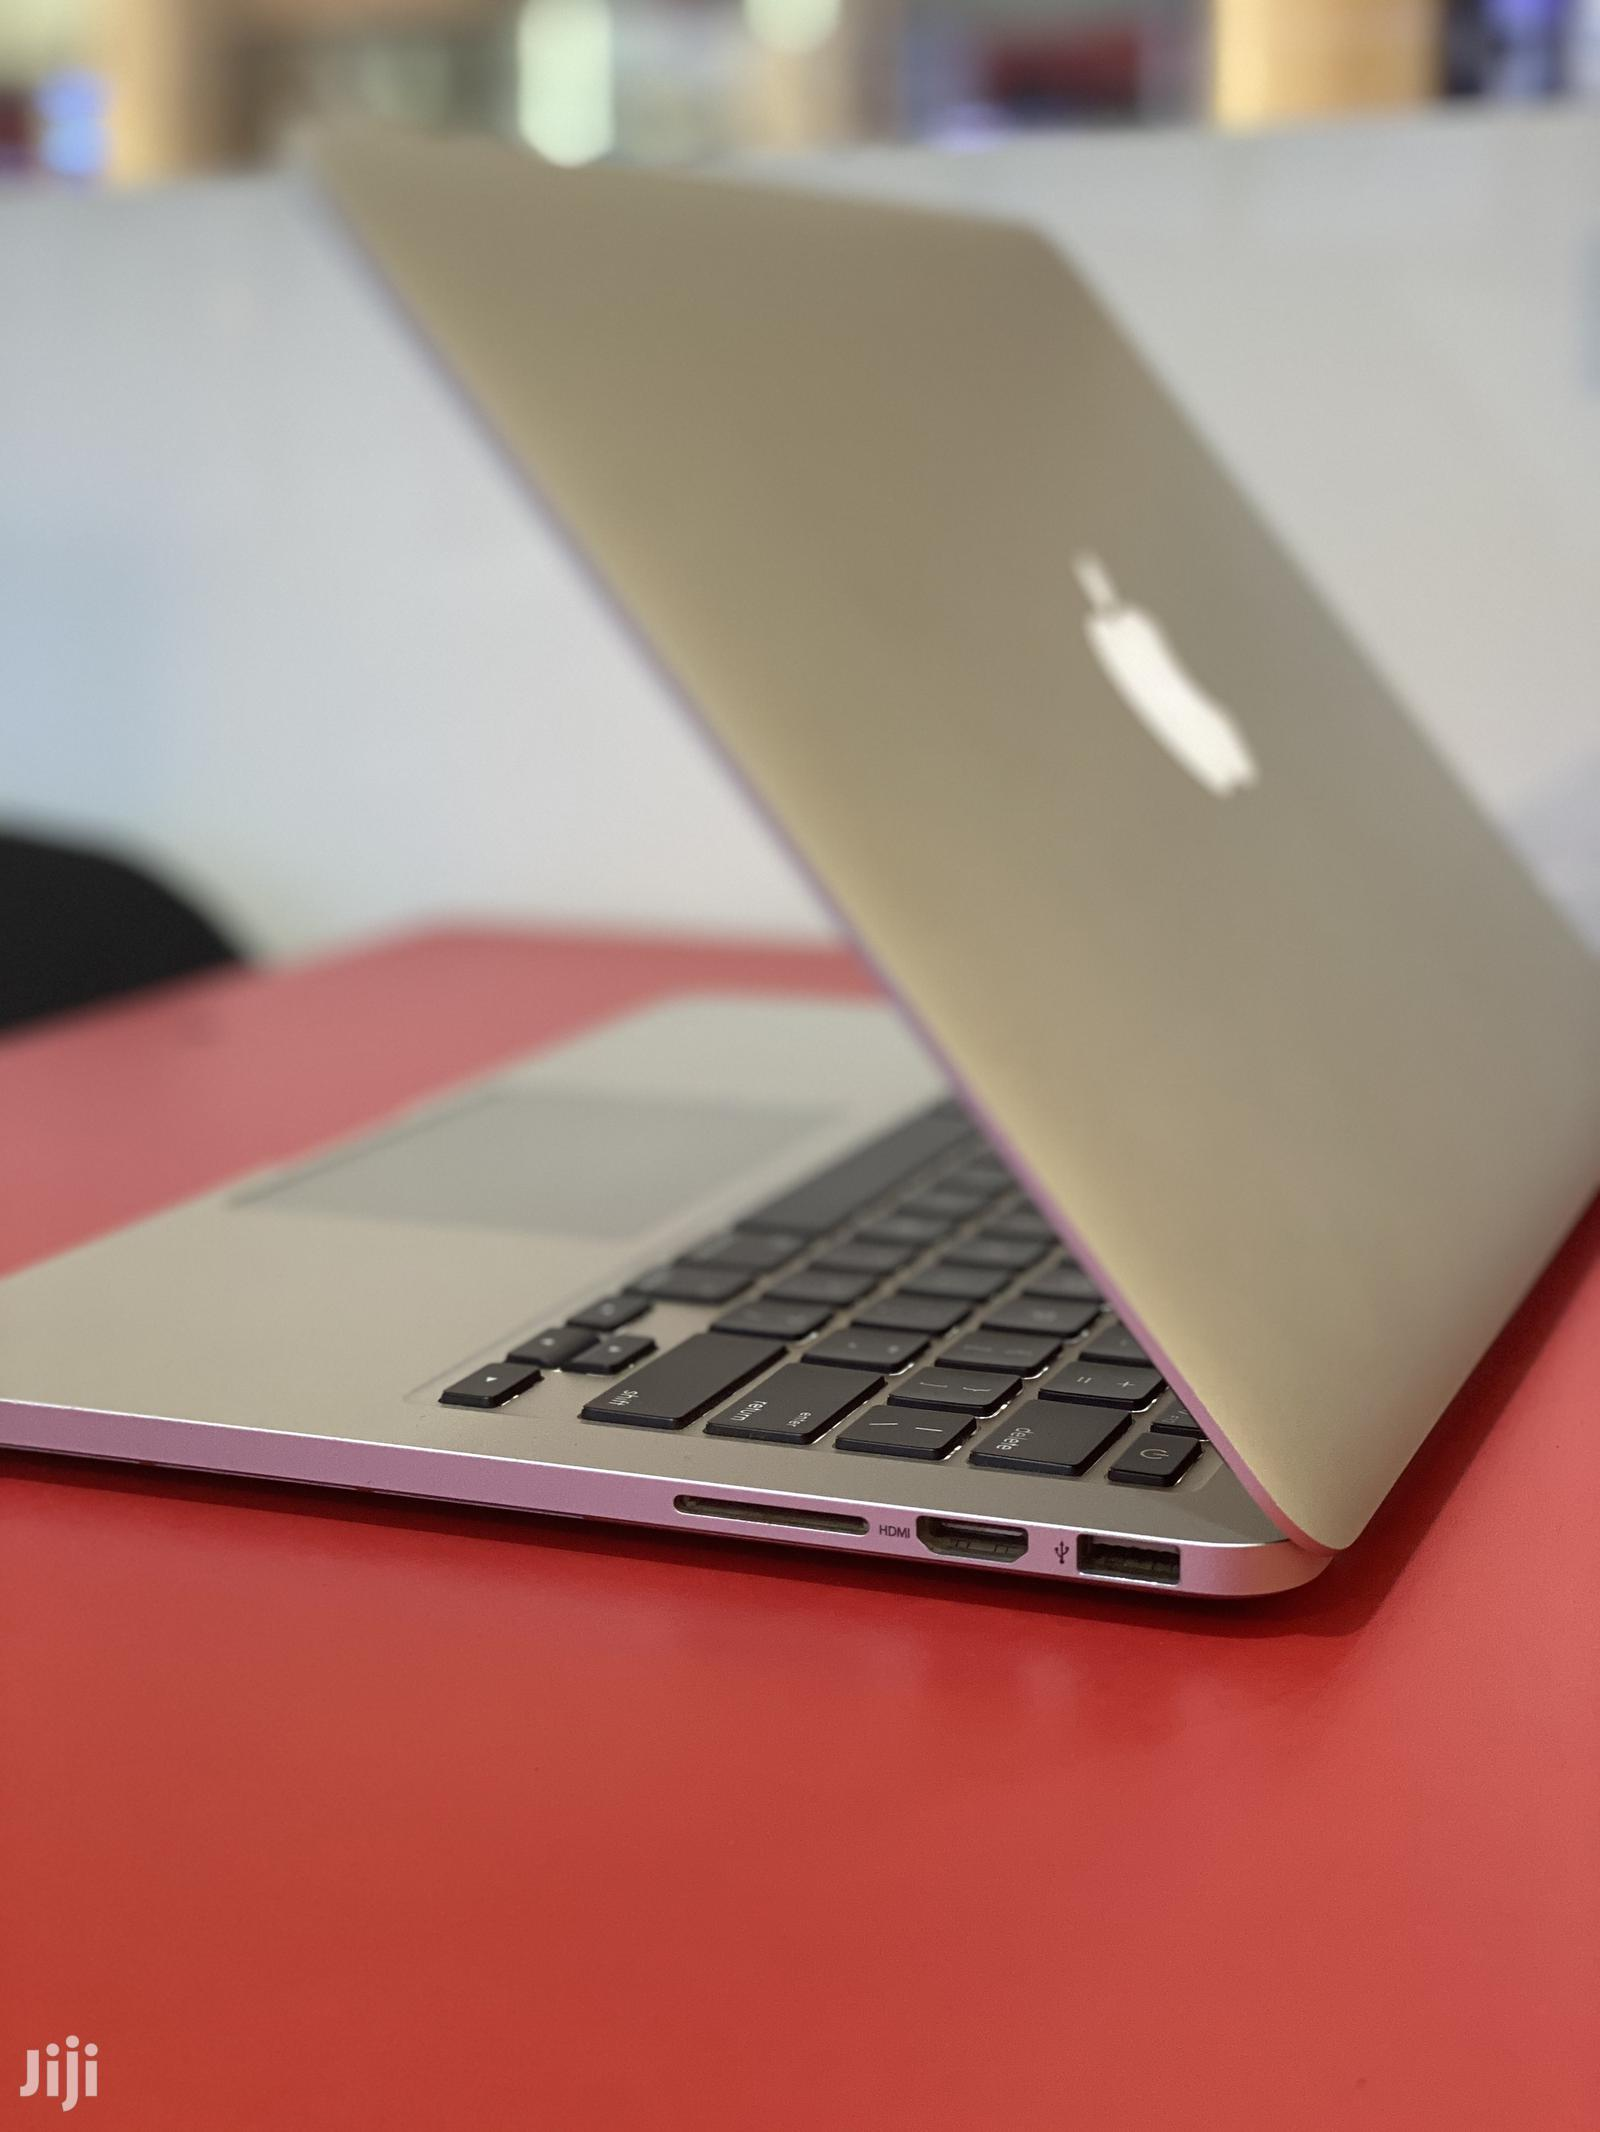 Laptop Apple MacBook Pro 8GB Intel Core I5 SSHD (Hybrid) 128GB | Laptops & Computers for sale in Kampala, Central Region, Uganda